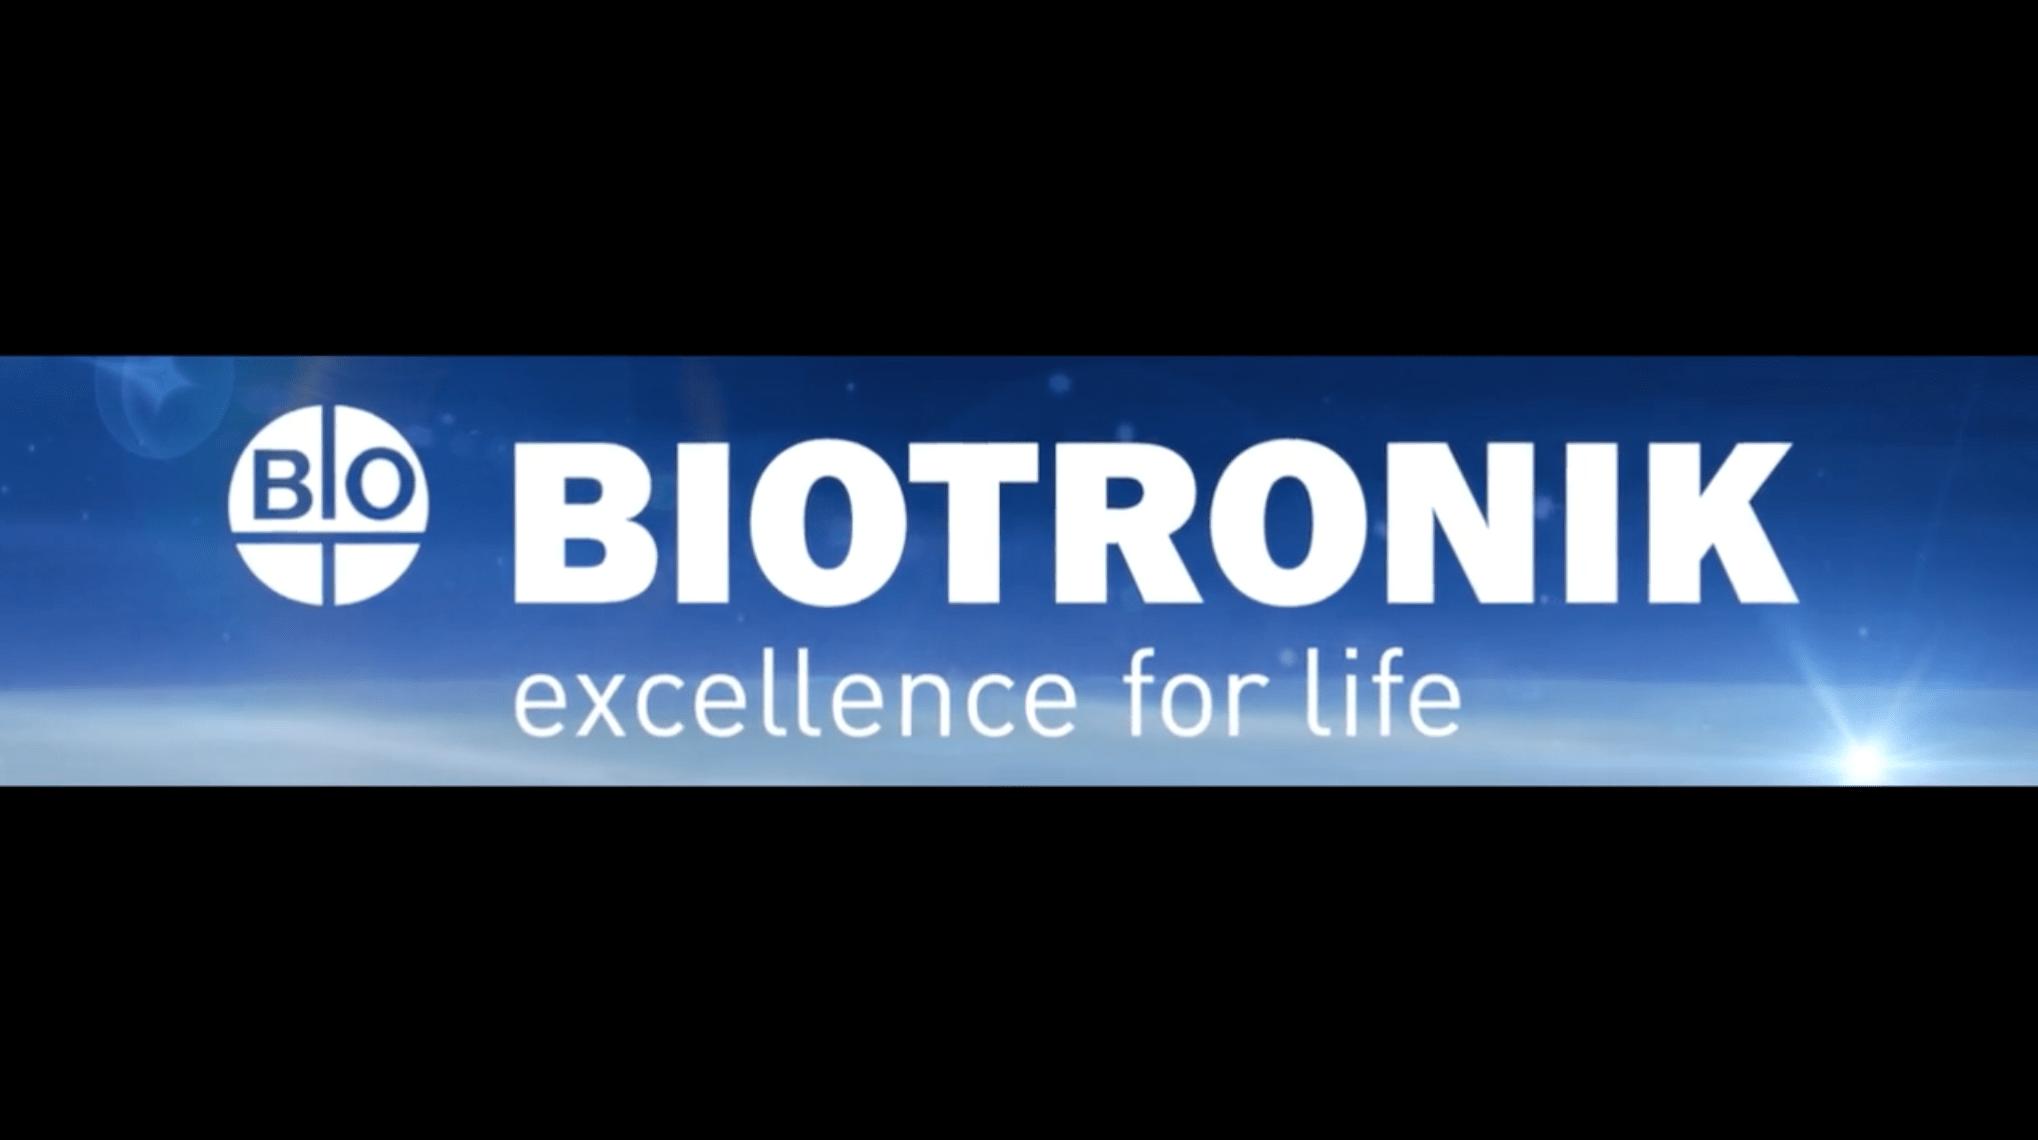 Biotronik logo